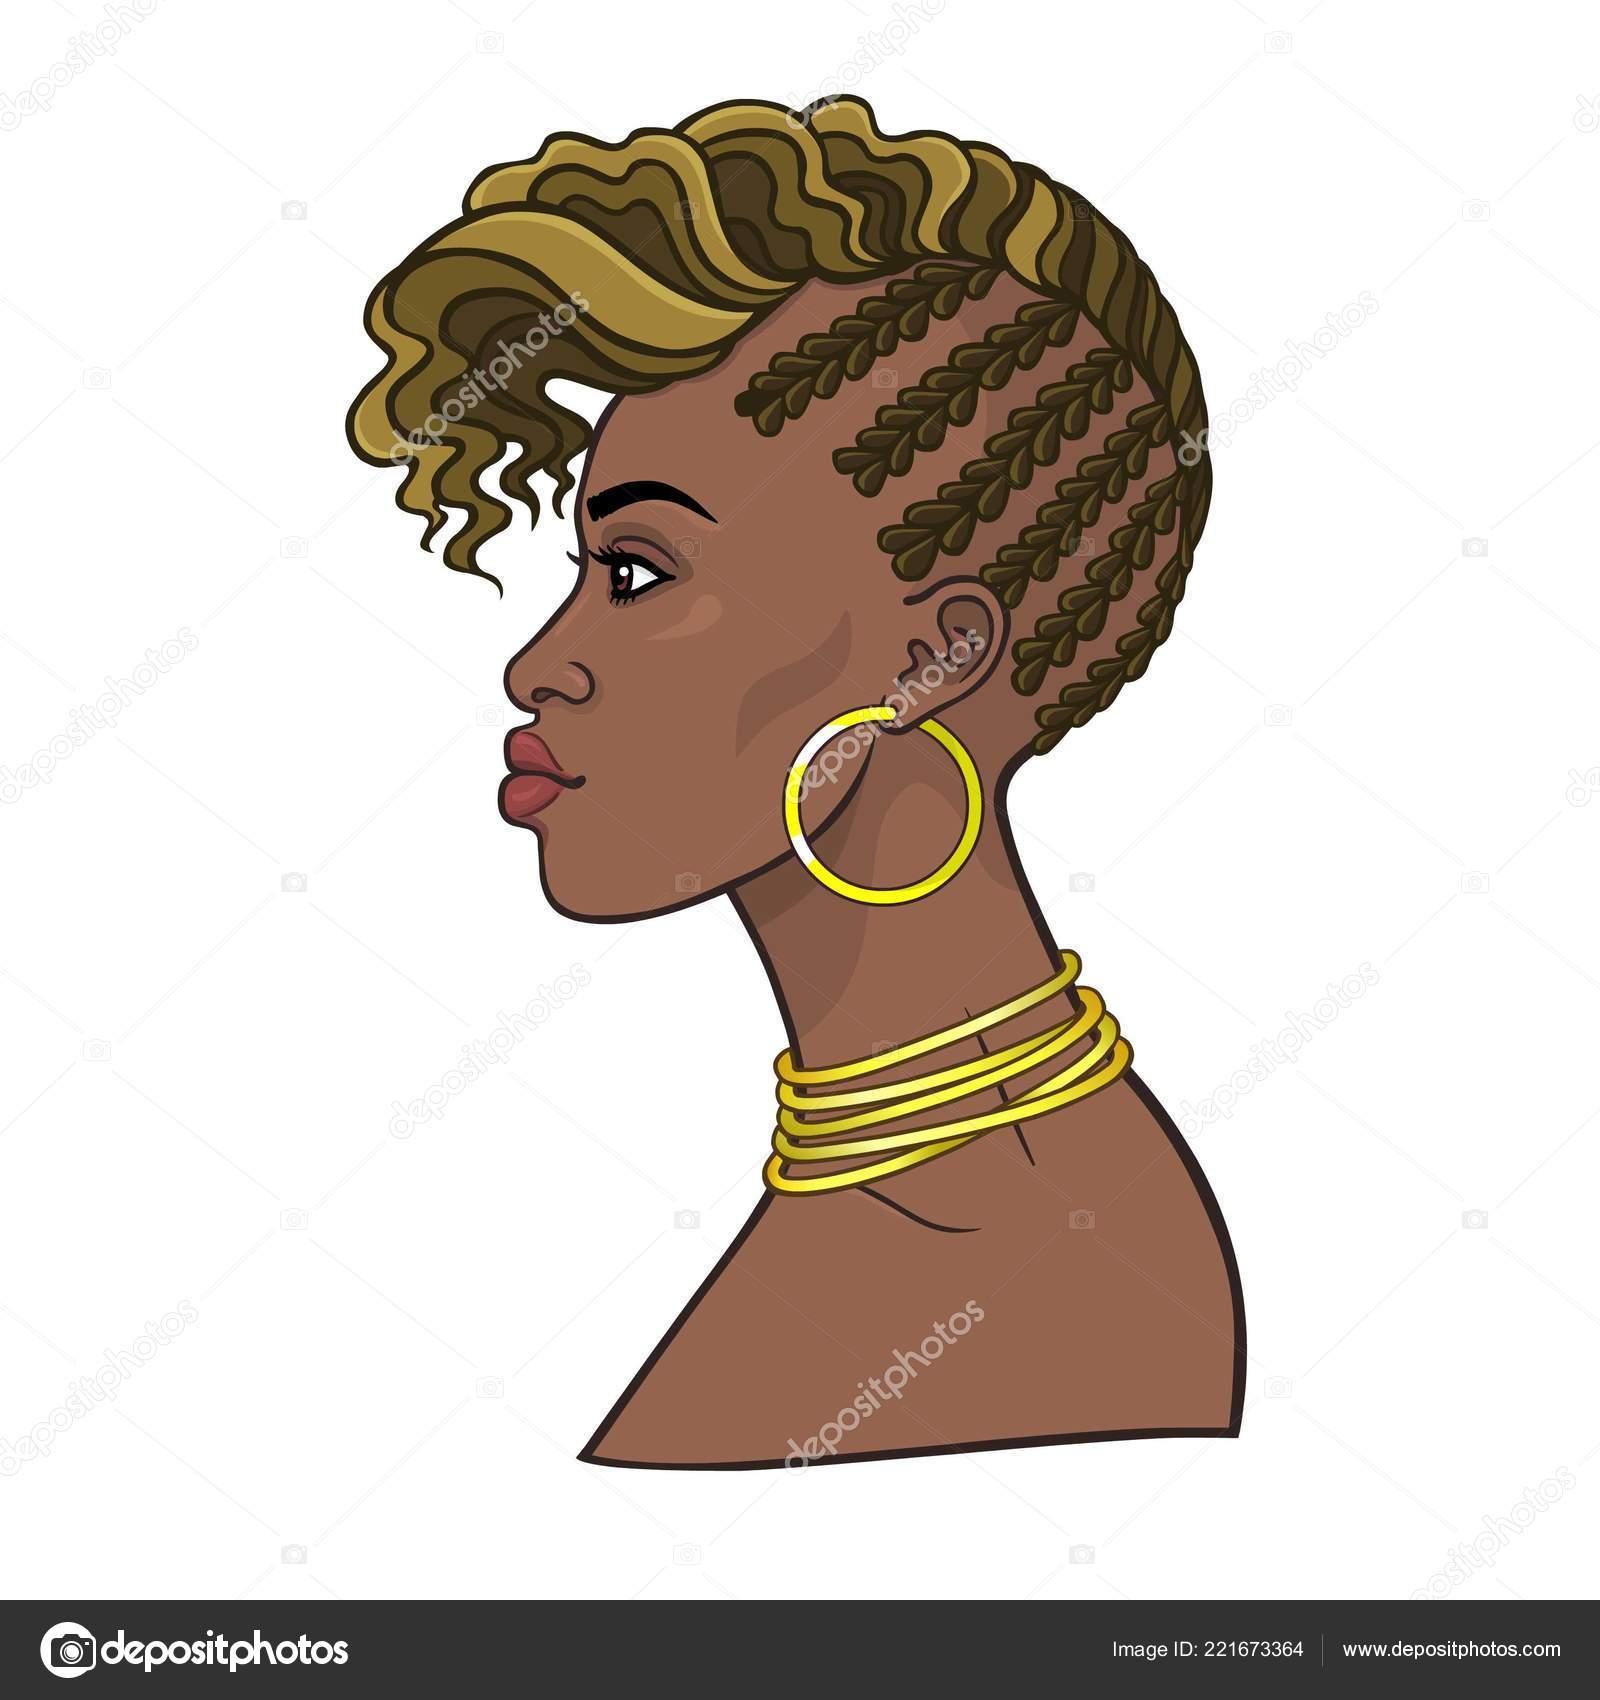 Animaci Portret Mlade Africke Zeny Zobrazeni Profilu Barva Kresby